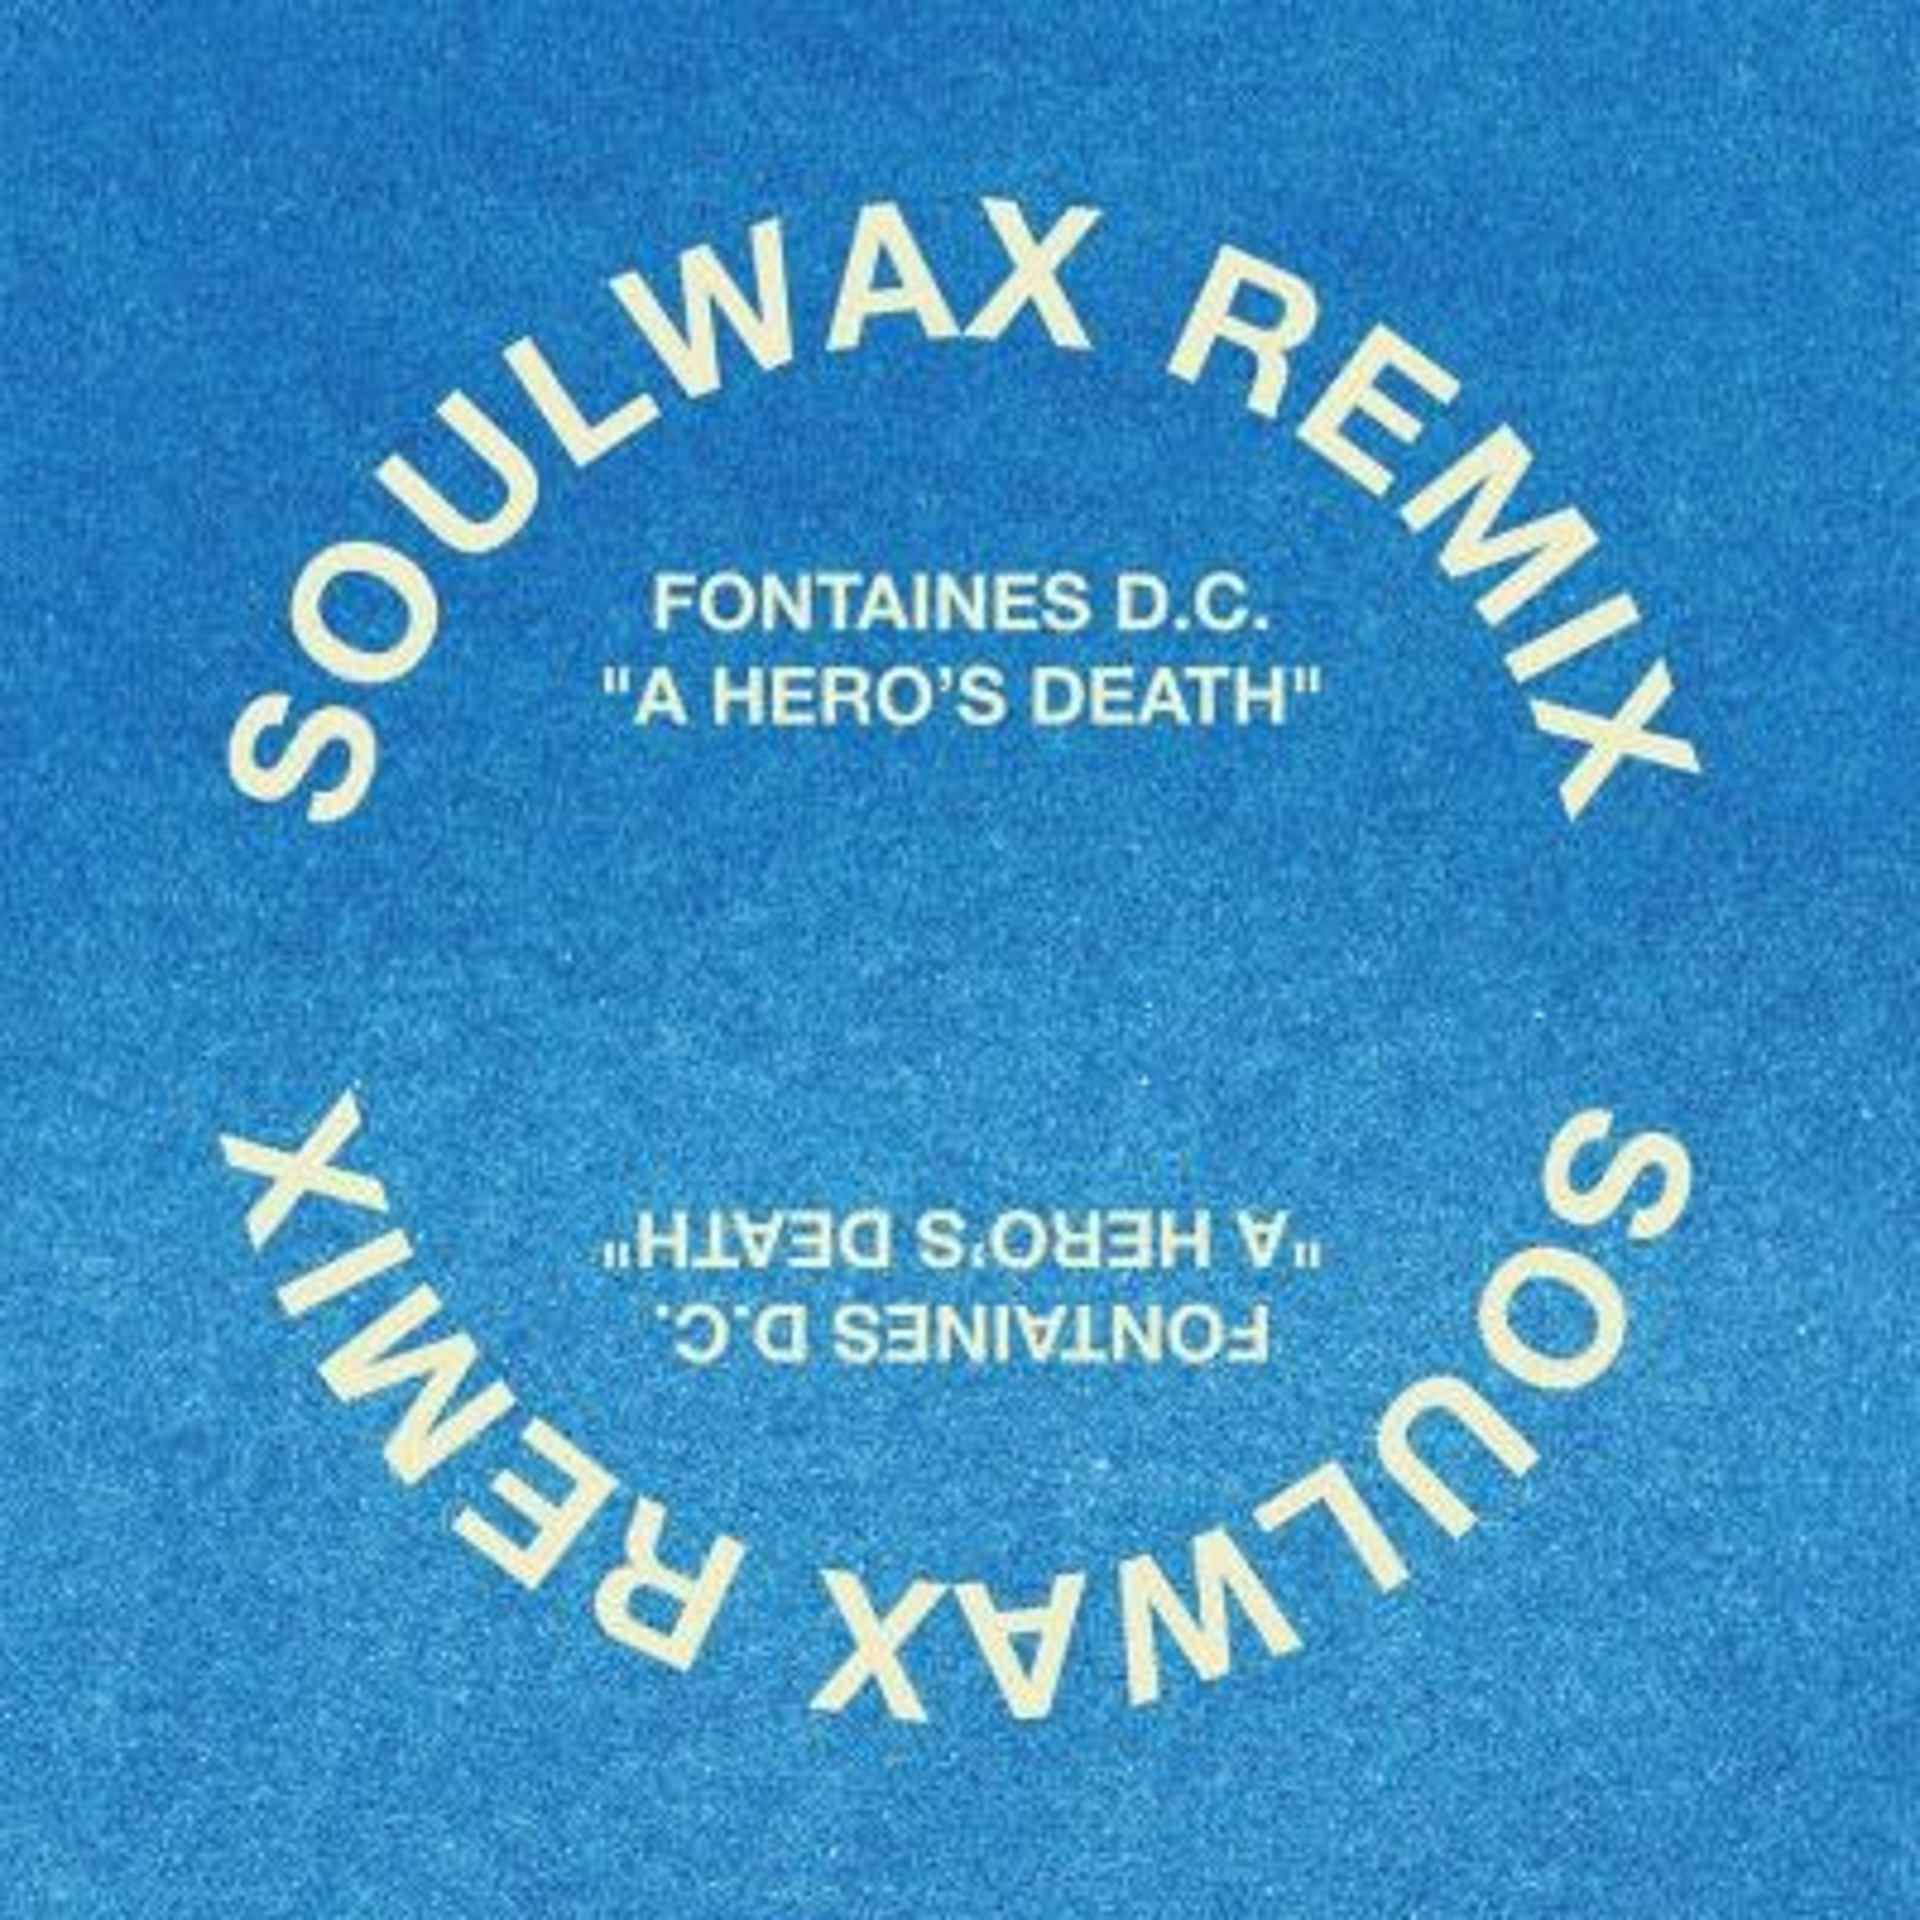 A HERO'S DEATH (SOULWAX REMIX)